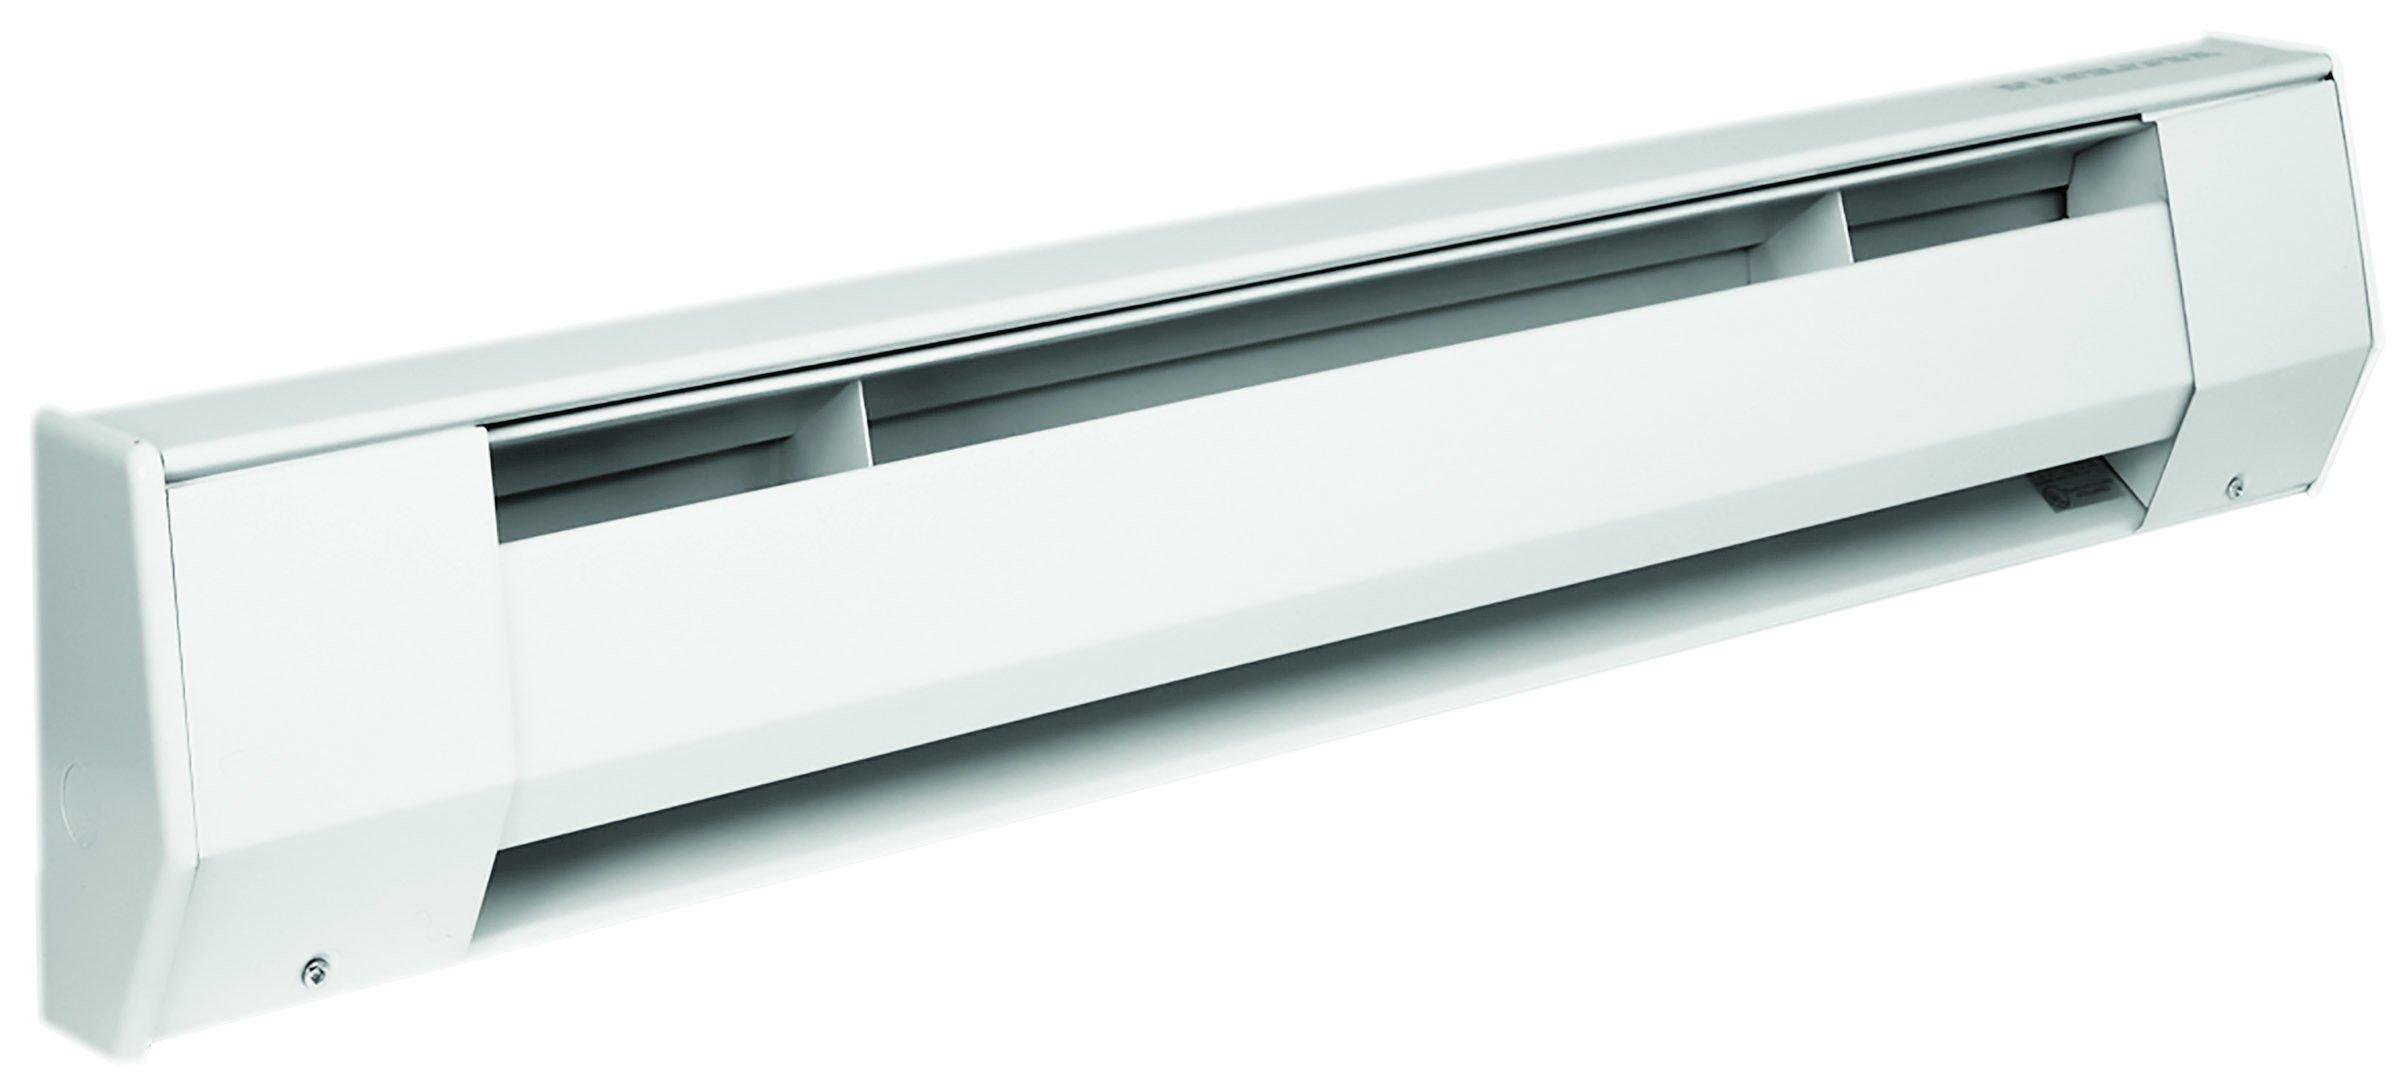 King 6K2415BW 1,500-1,125-Watt 240/208-Volt 6-Foot Baseboard Heater, Bright White